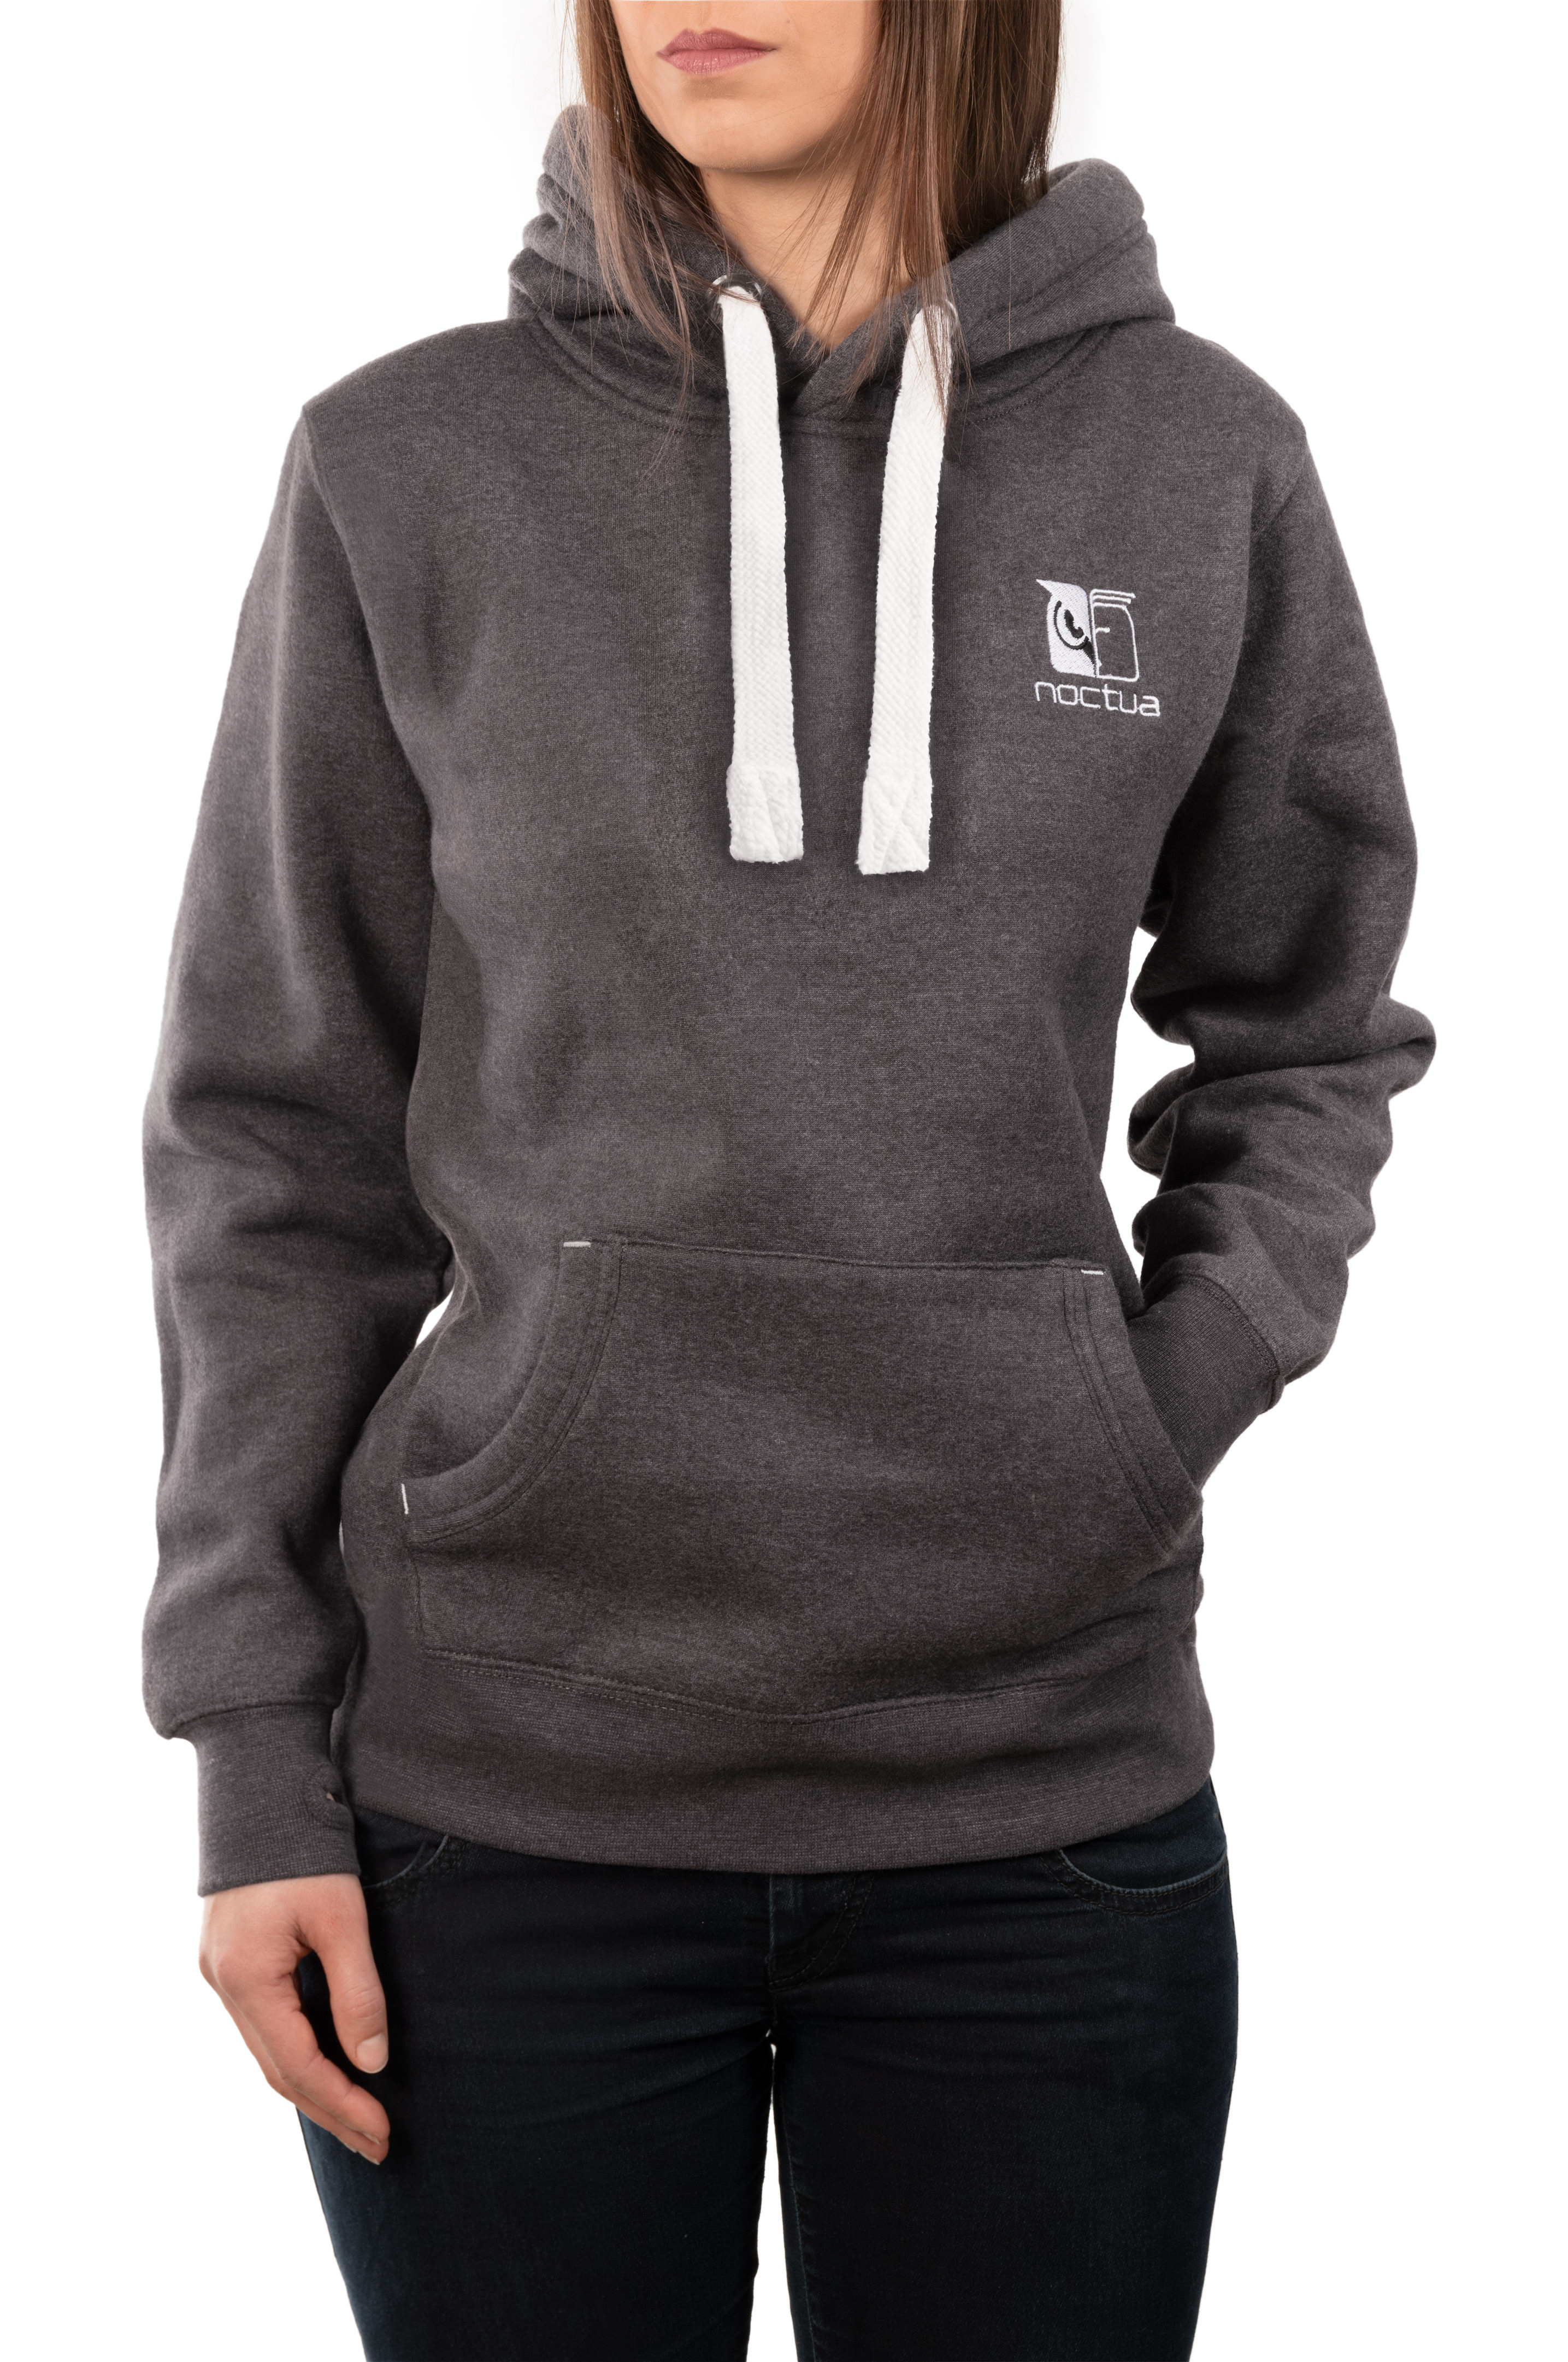 noctua_np_h1_grey_hoodie_2